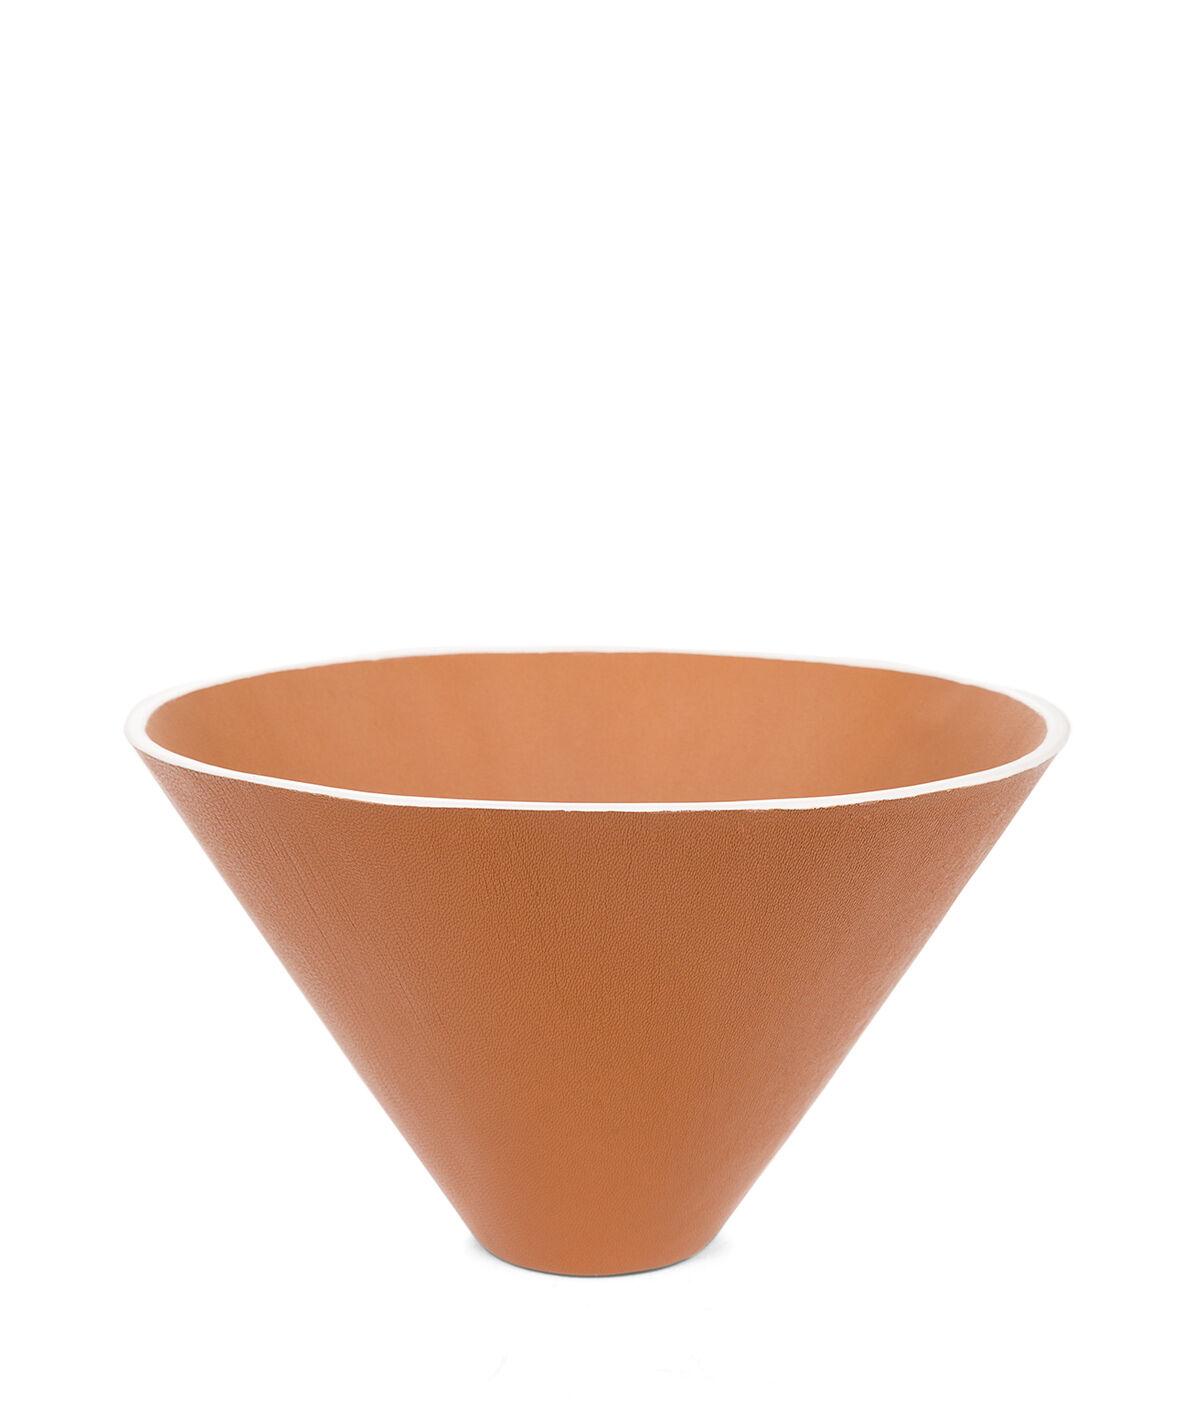 LOEWE Bowl M 深棕色 all